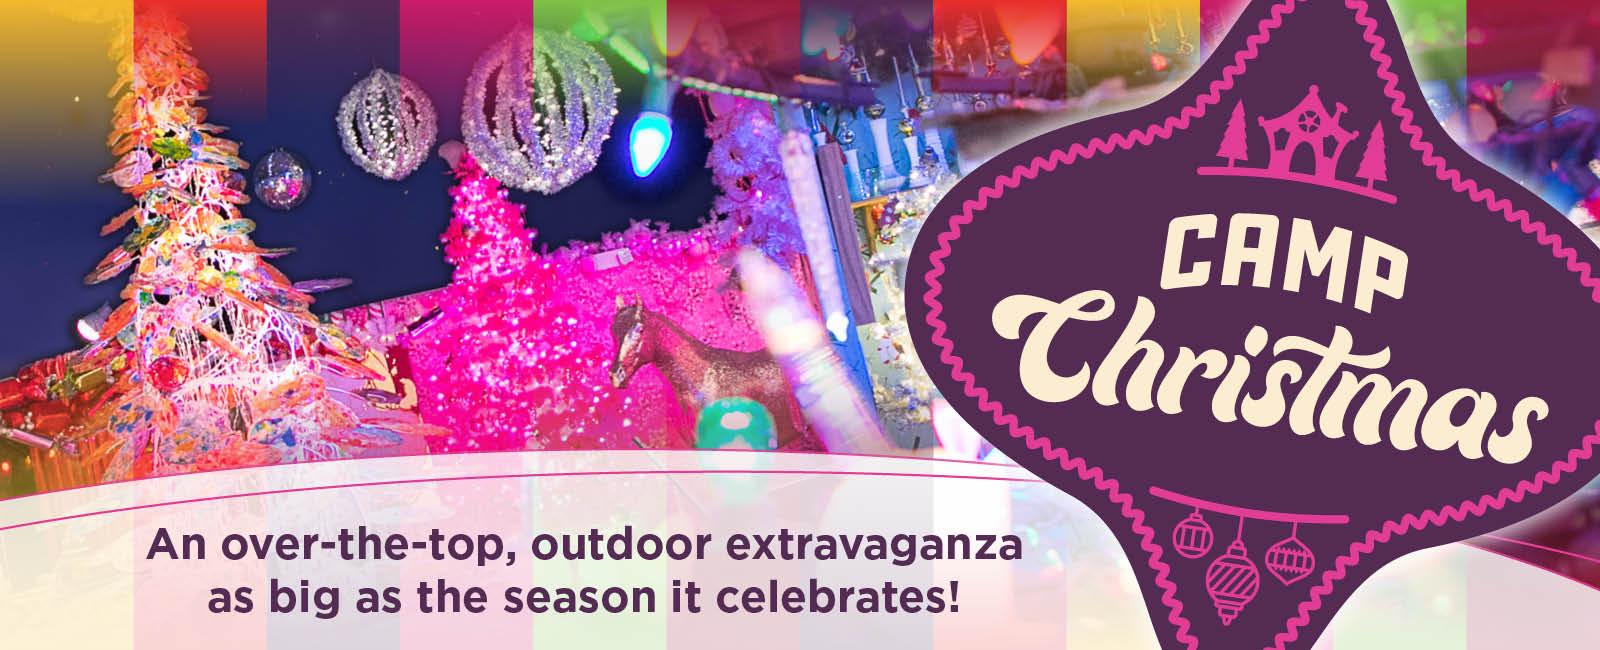 An over-the-top, outdoor extravaganza as big as the season it celebrates!